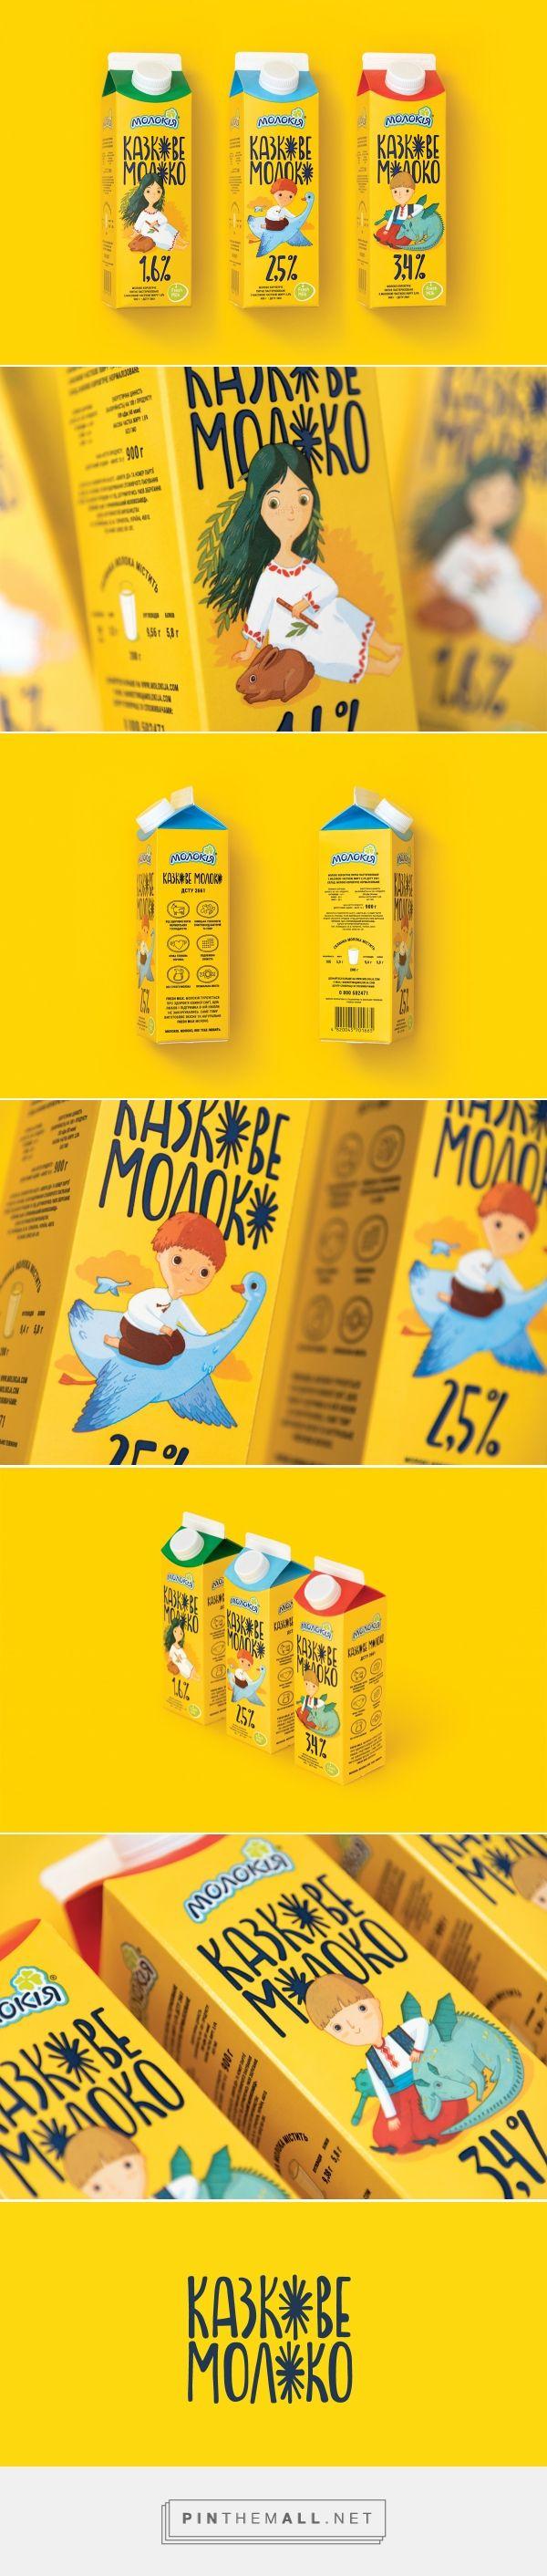 Fairy Milk packaging design by Yurko Gutsulyak - http://www.packagingoftheworld.com/2017/08/fairy-milk.html